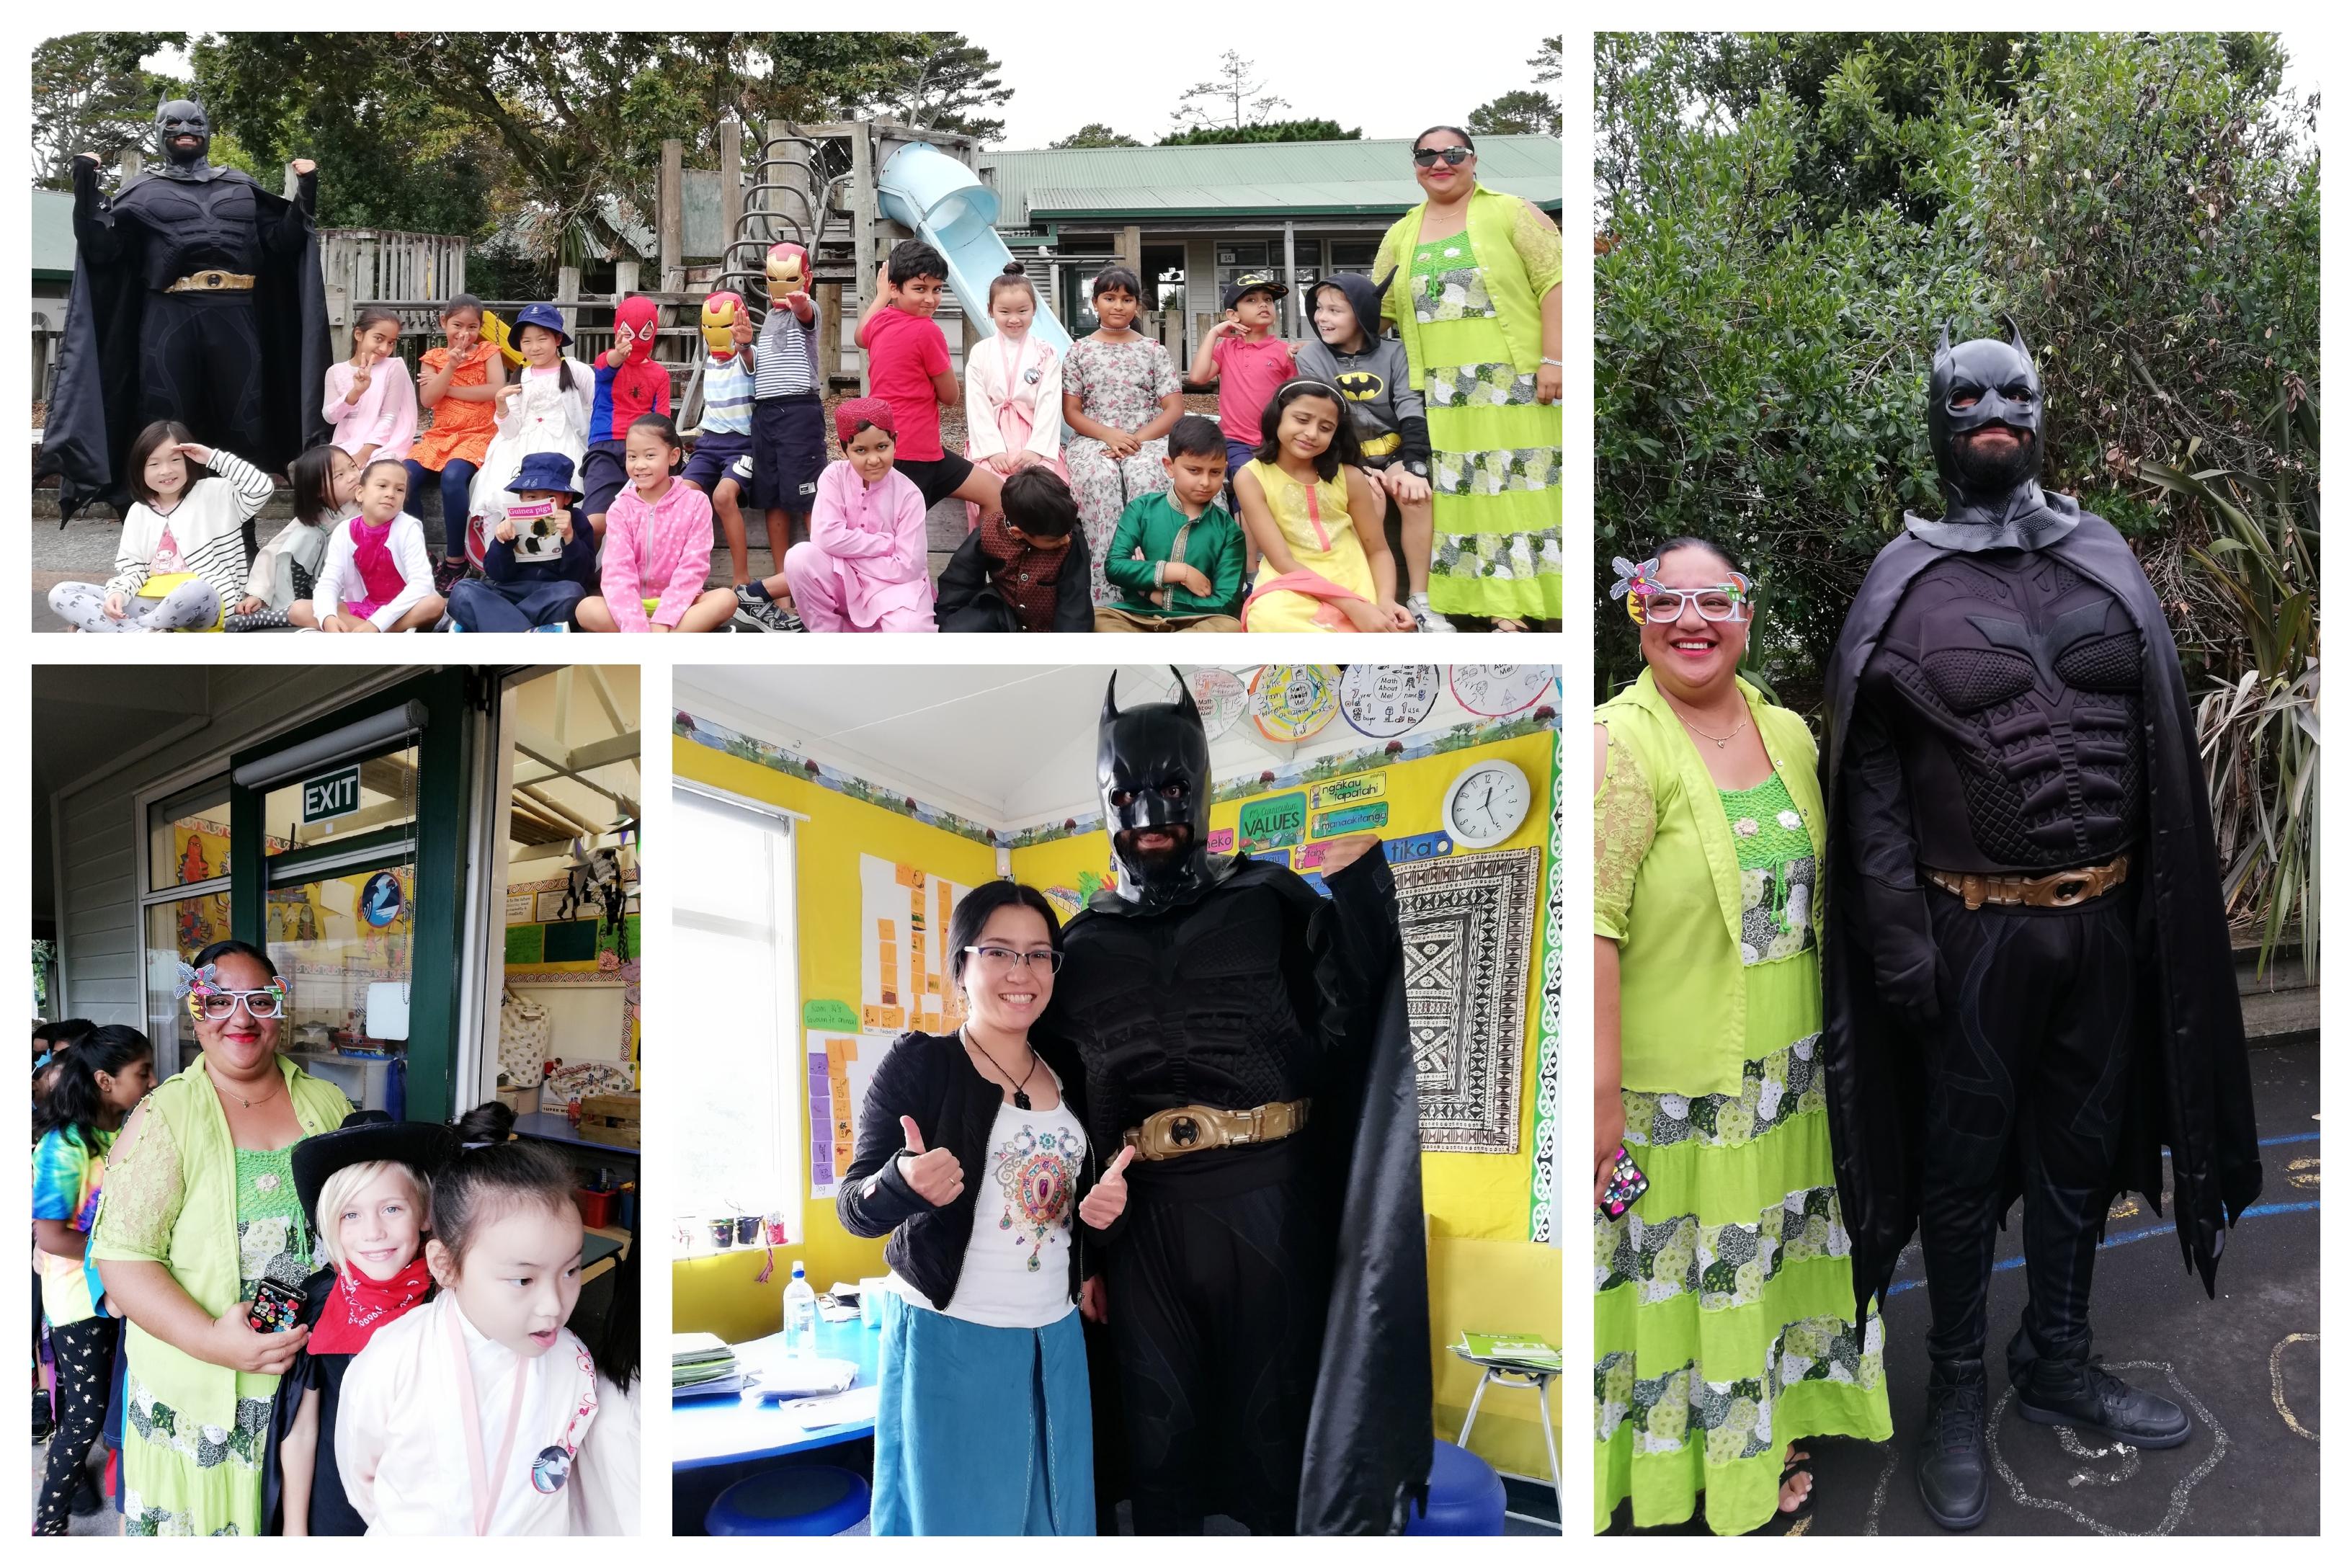 Blockhouse Bay Primary School - Superhero Day at Blockhouse Bay